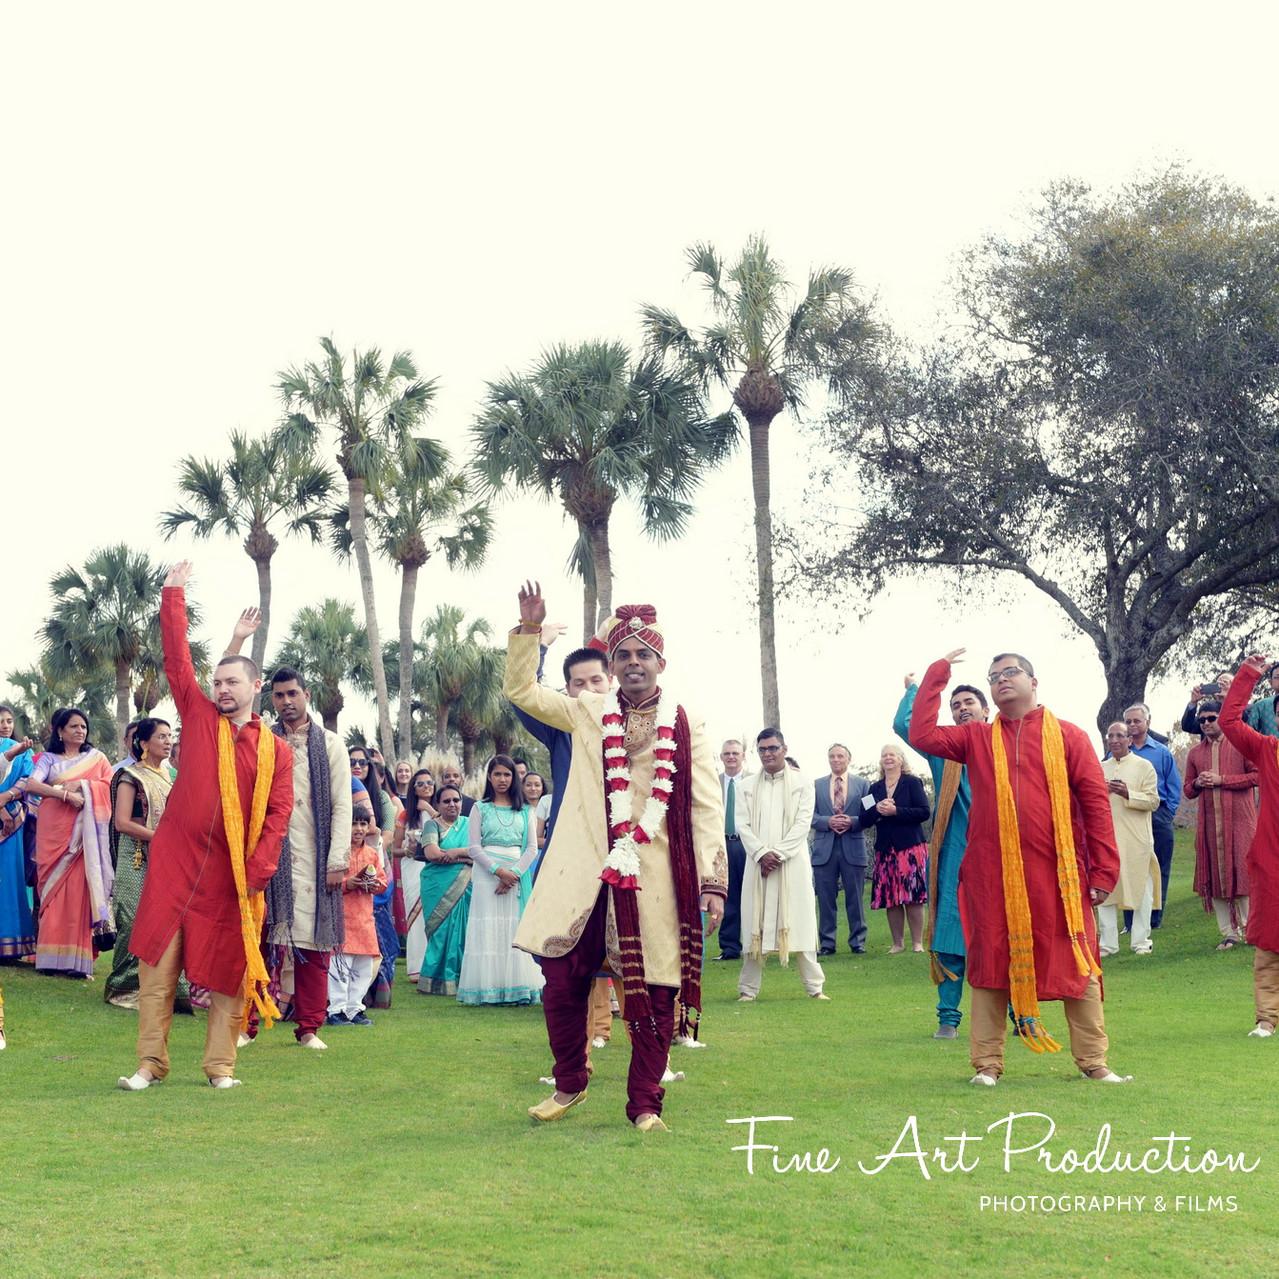 Hyatt-Regency-Grand-Cypress-Indian-Wedding-Photography-Fine-Art-Production-Amish-Thakkar_45